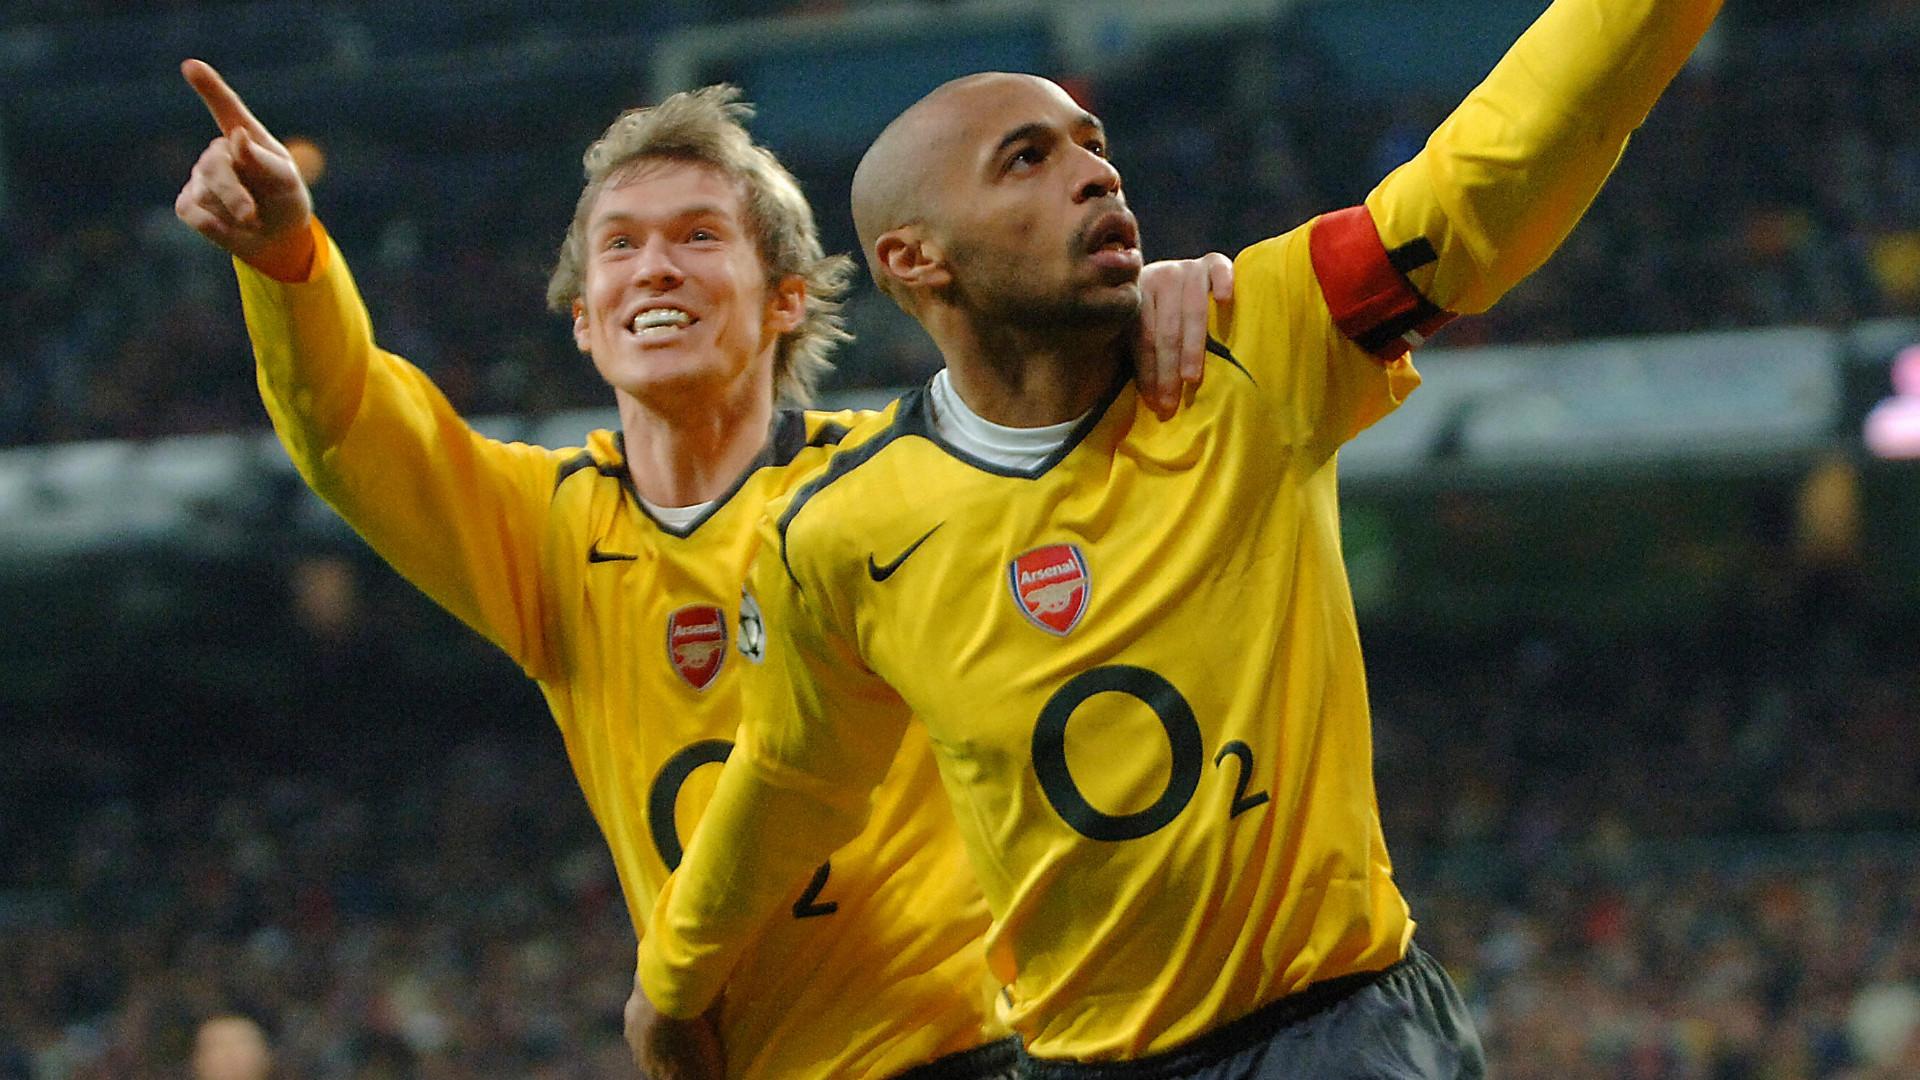 Aleksandr Hleb Thierry Henry Arsenal Premier League 21022006